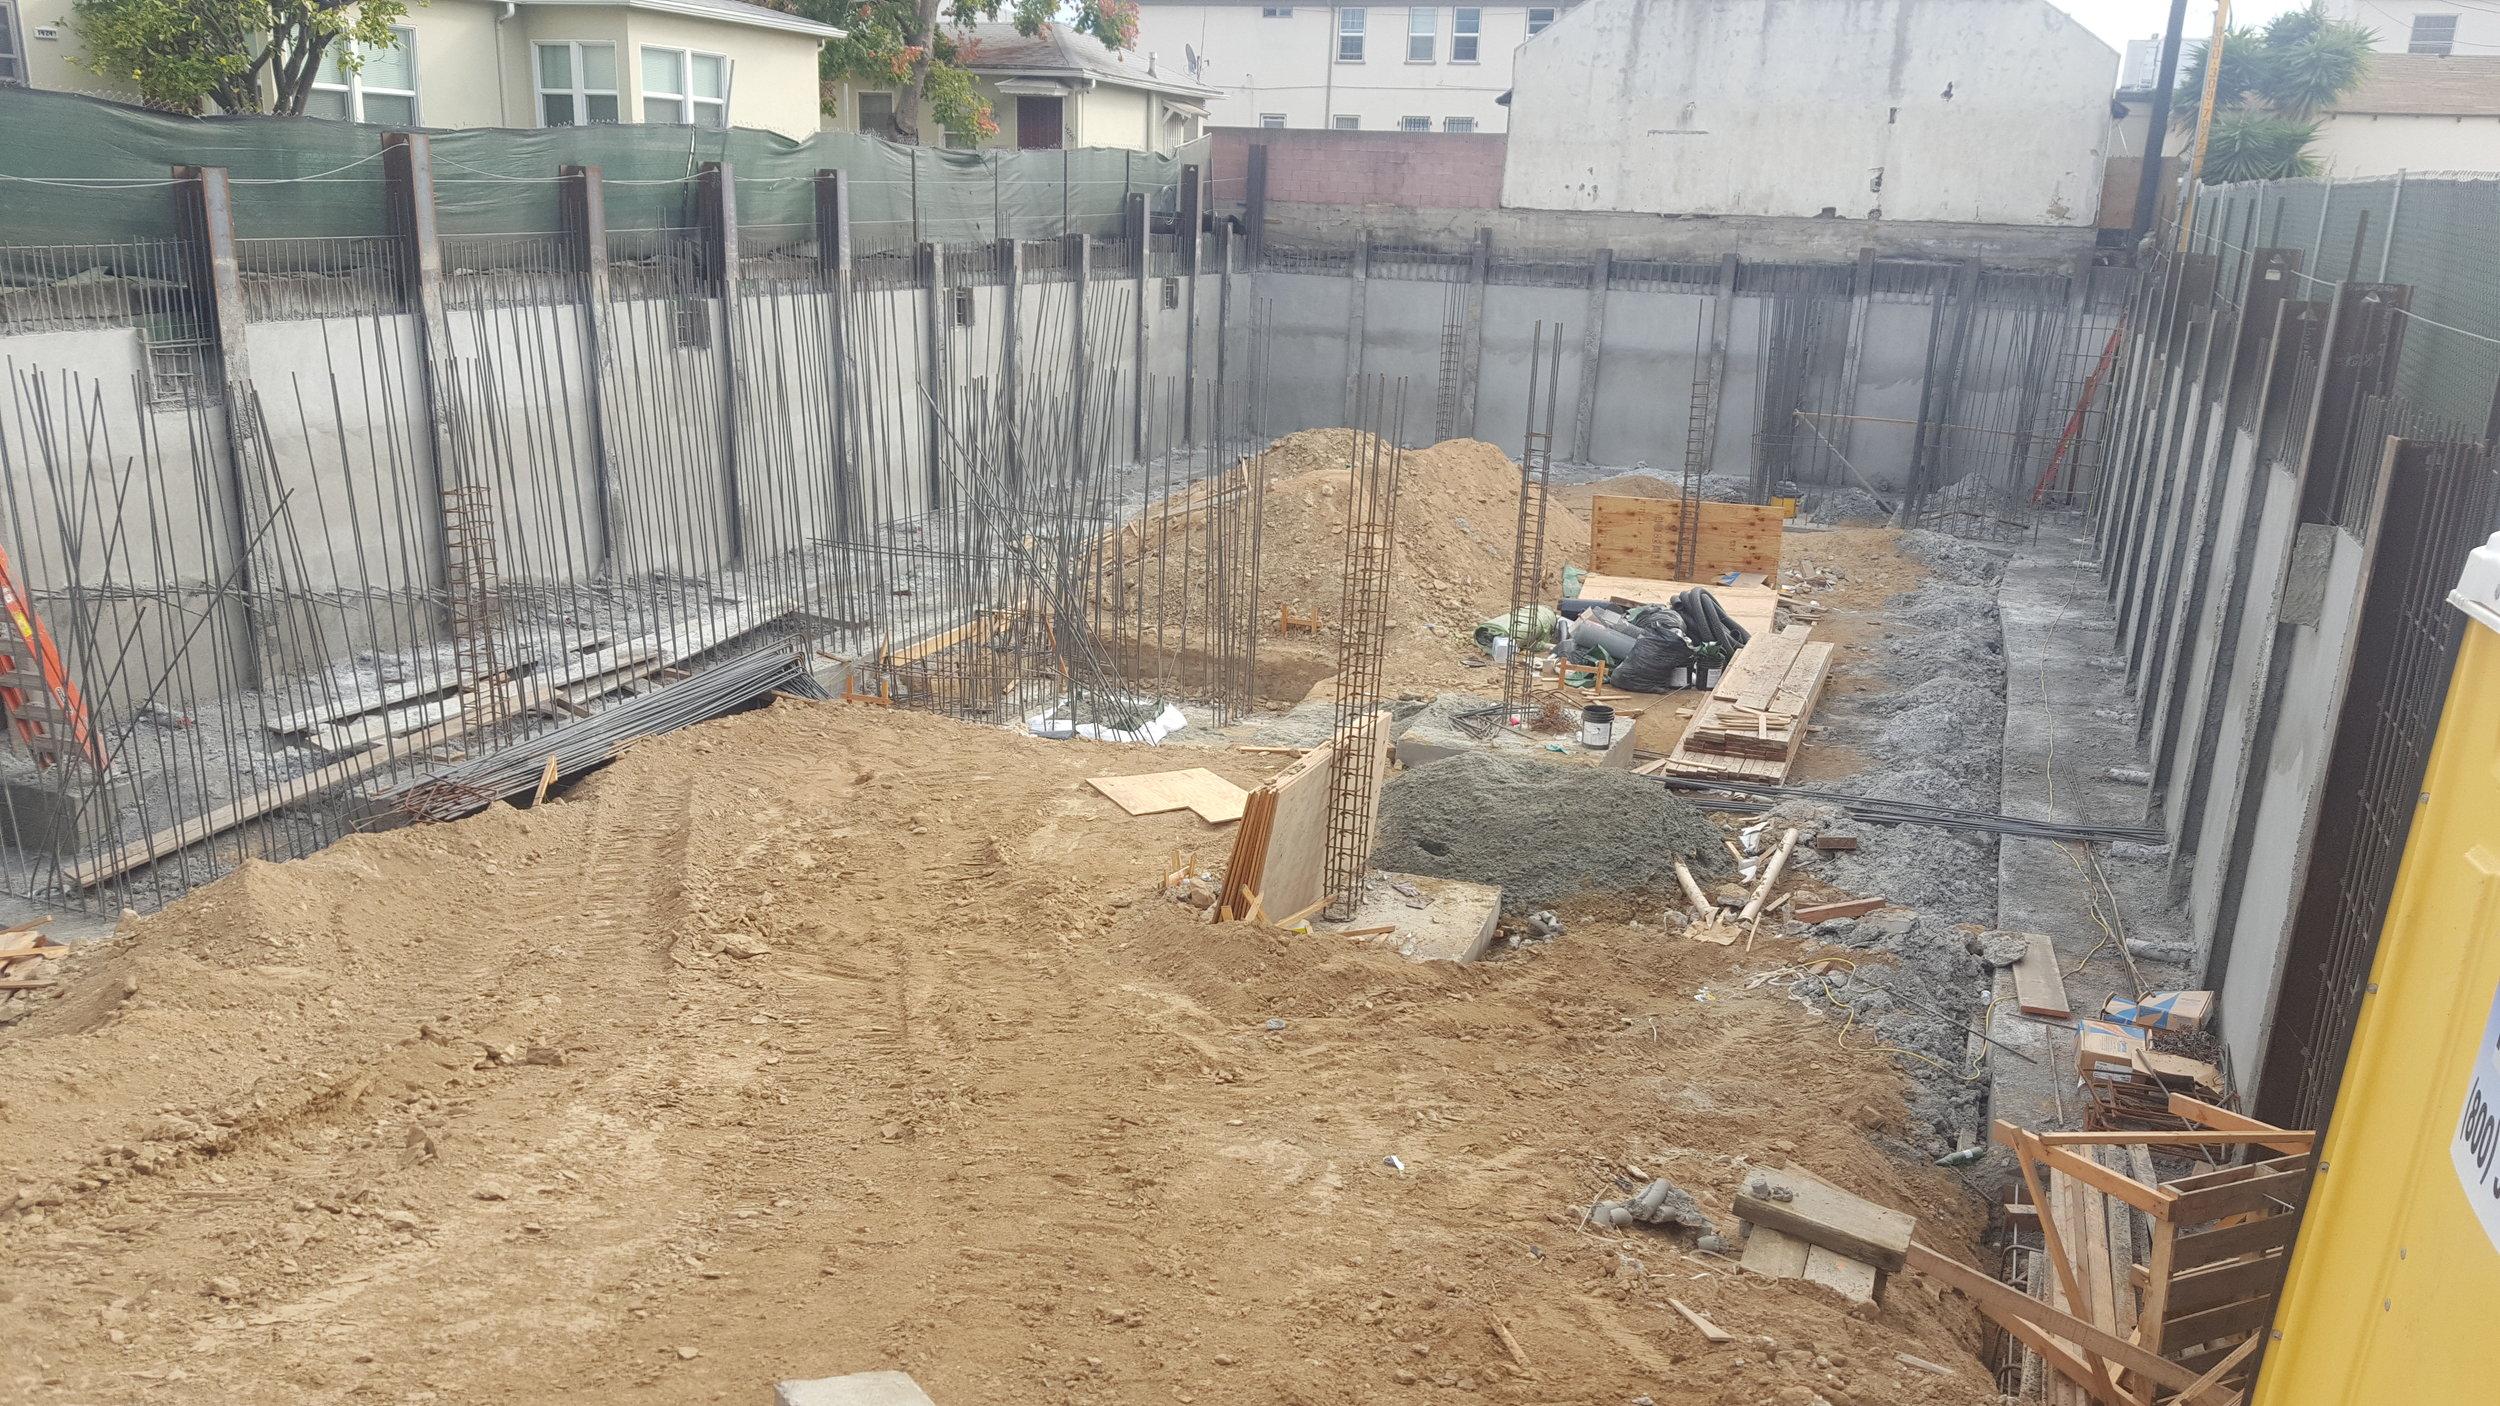 Subterranean parking garage for Multi Family development